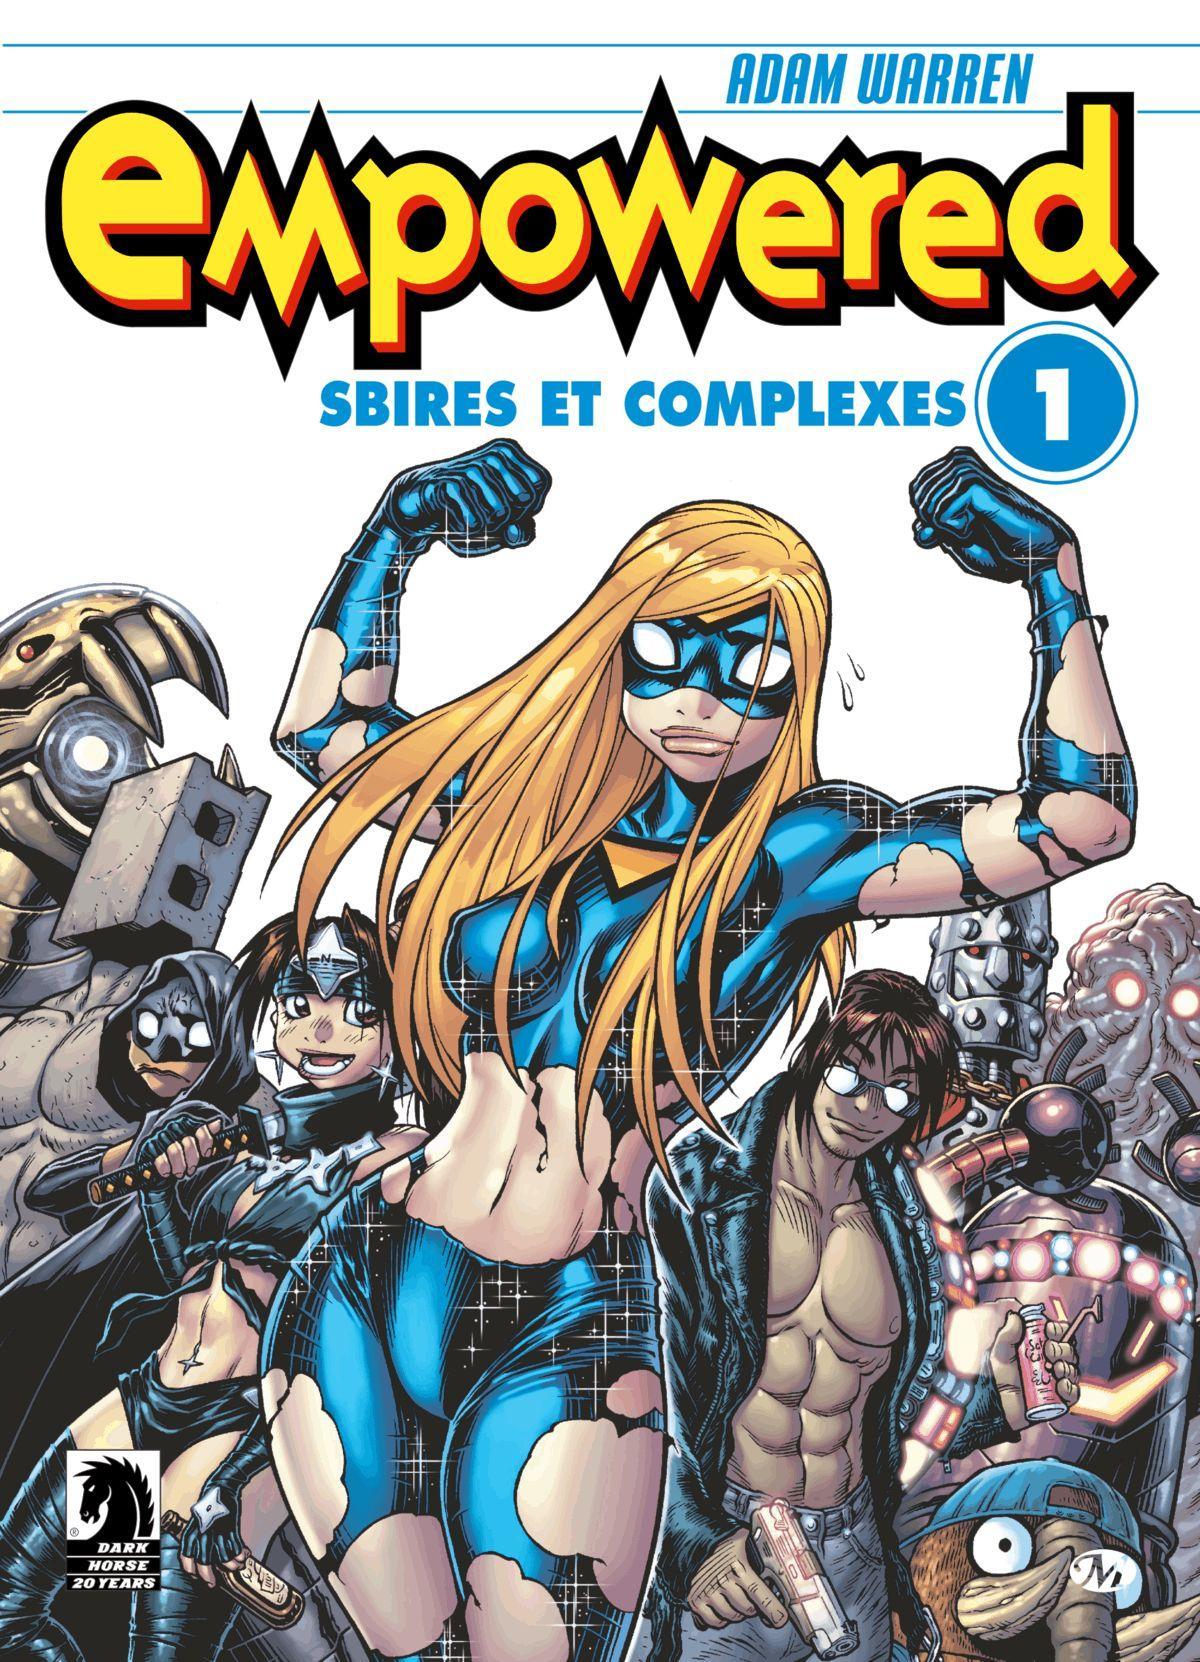 Empowered #1 : Sbires et complexes, EMPOWERED, T1